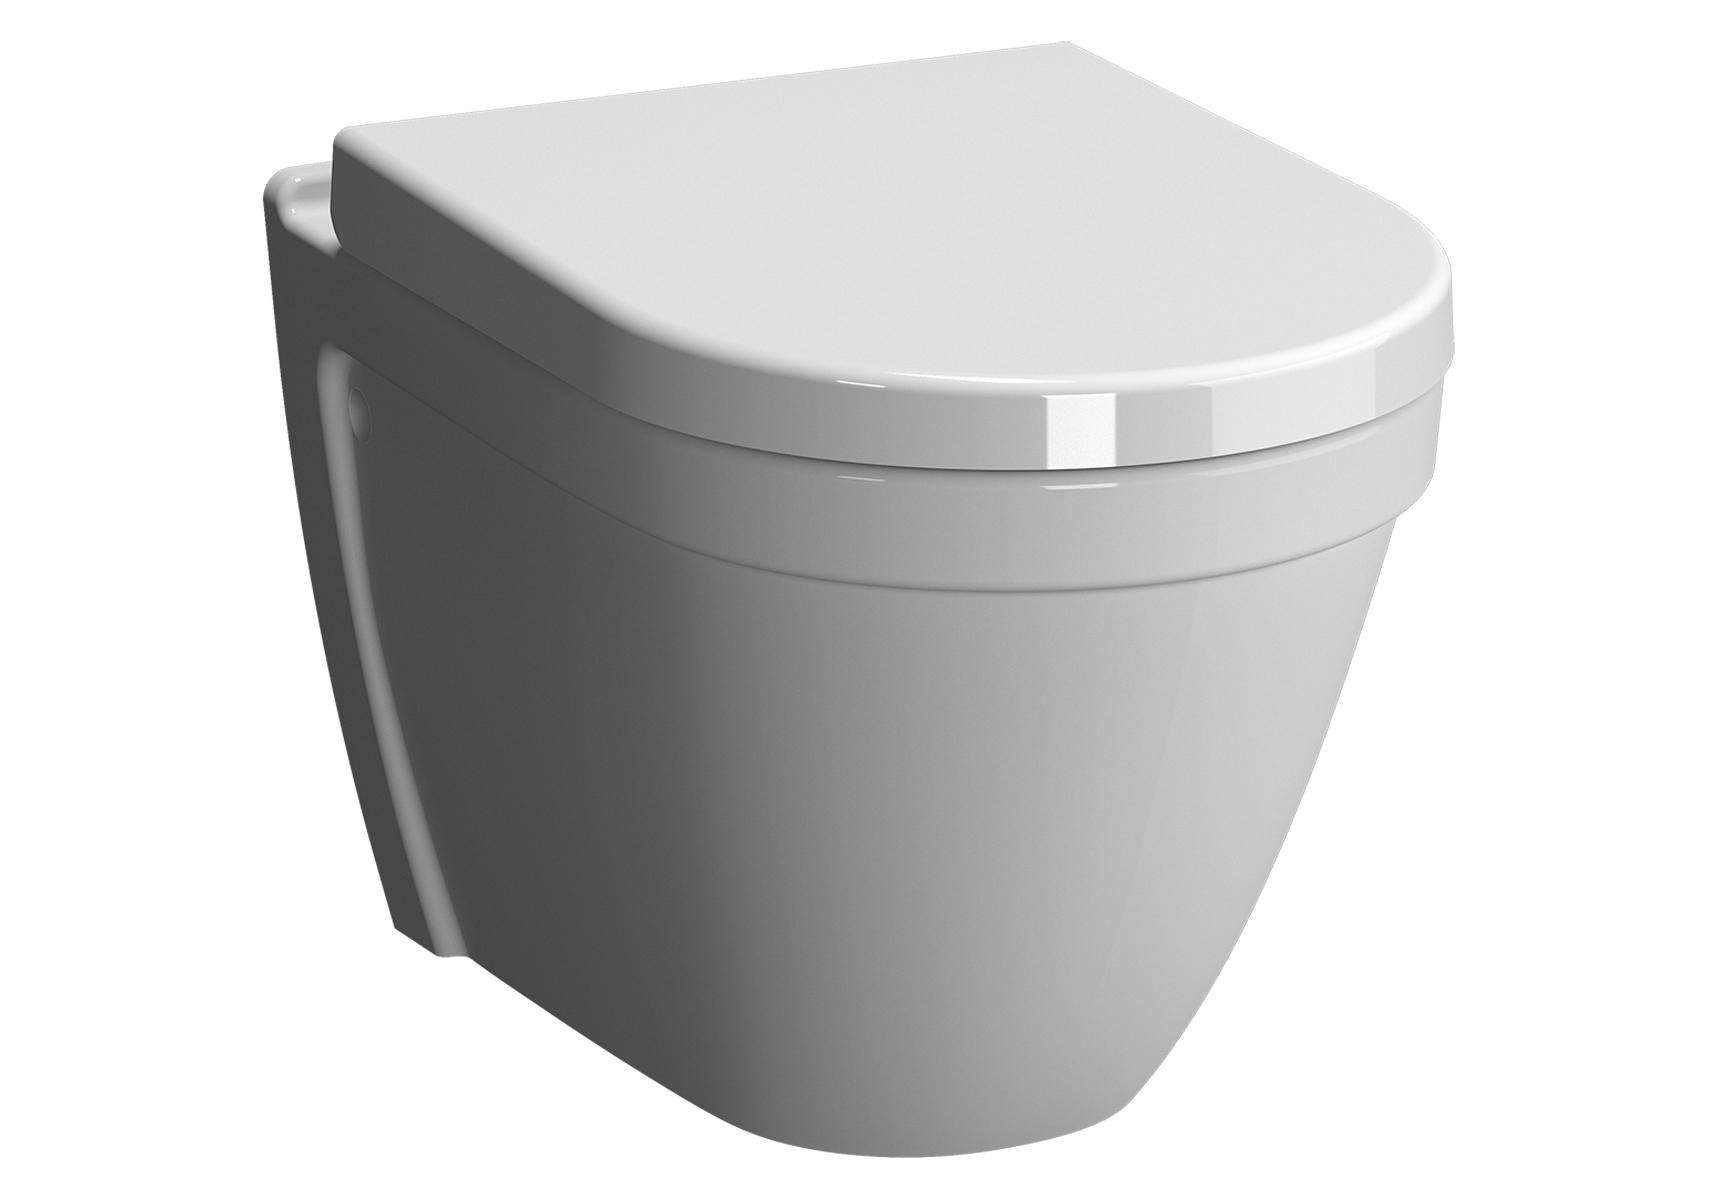 S50 WC suspendu sans bride, 54 cm